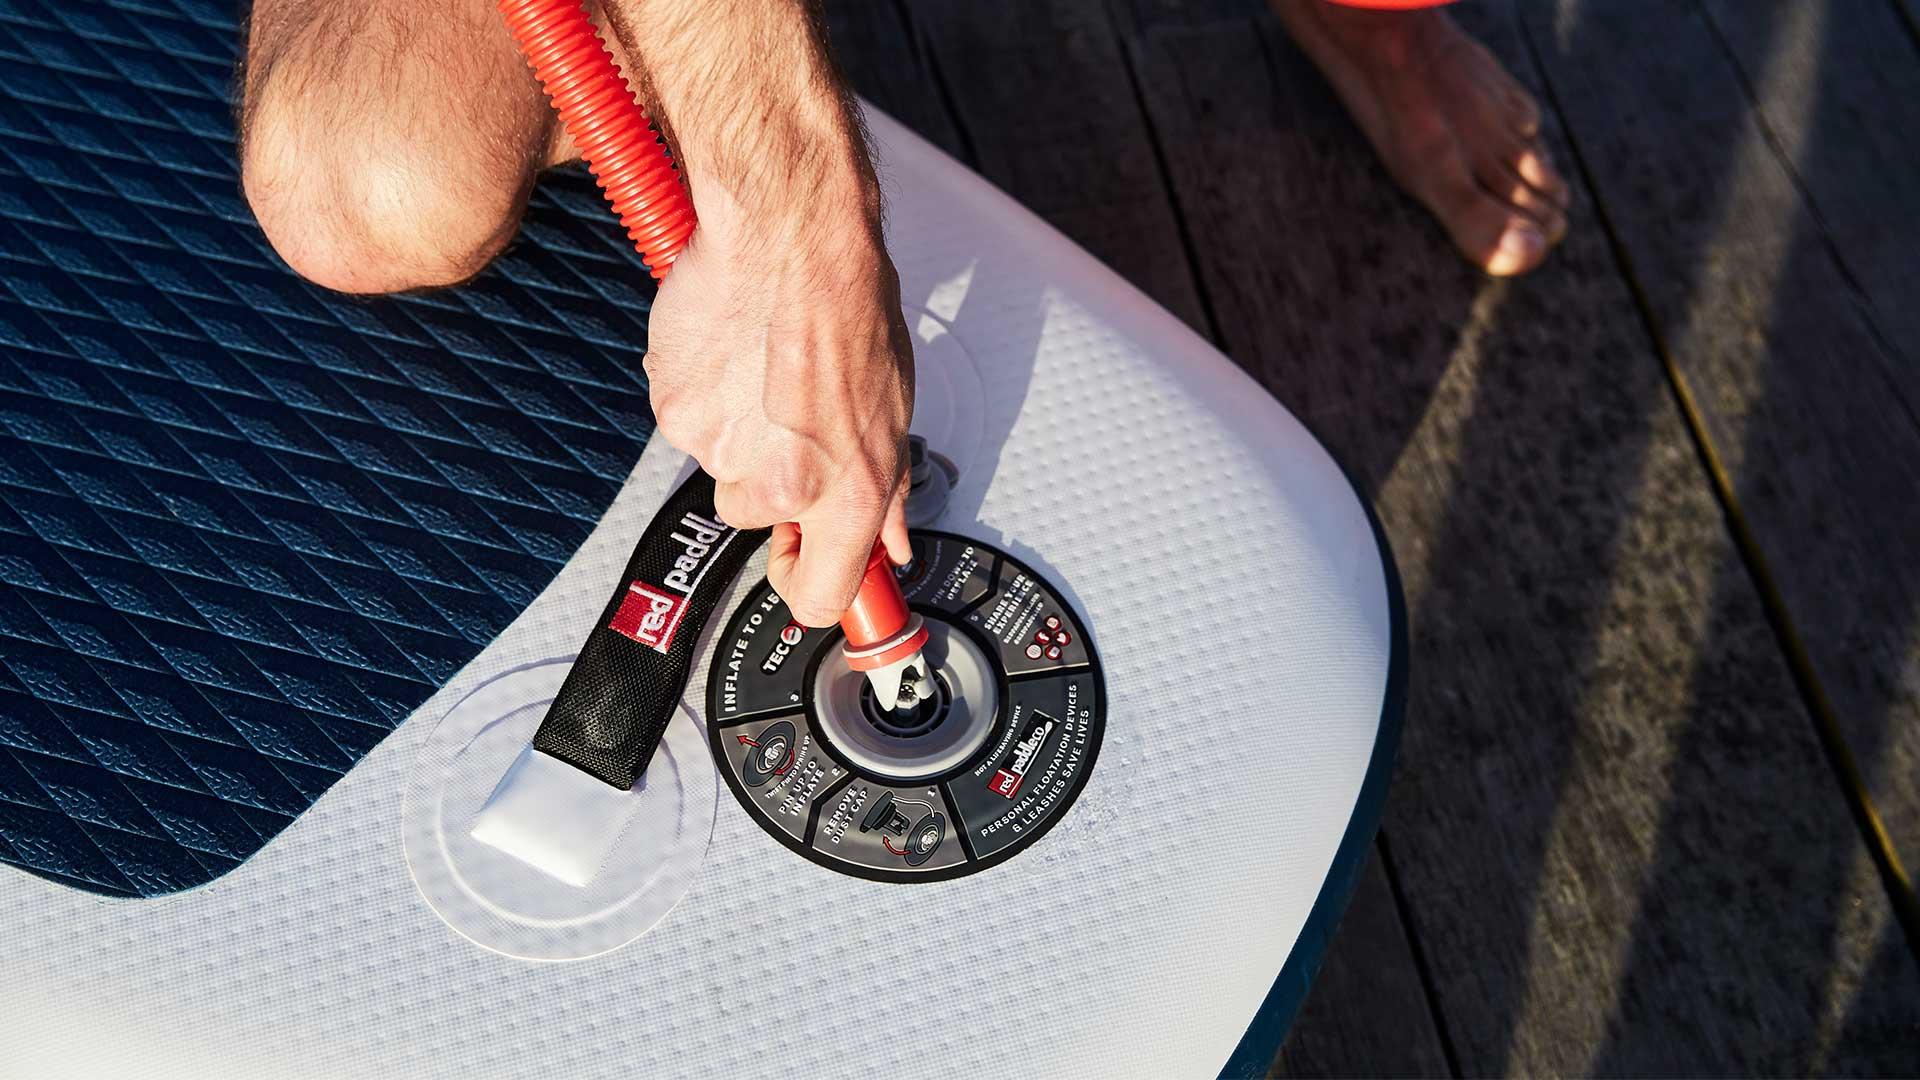 redpaddleco-110-sport-inflatable-paddle-board-desktop-gallery-valve